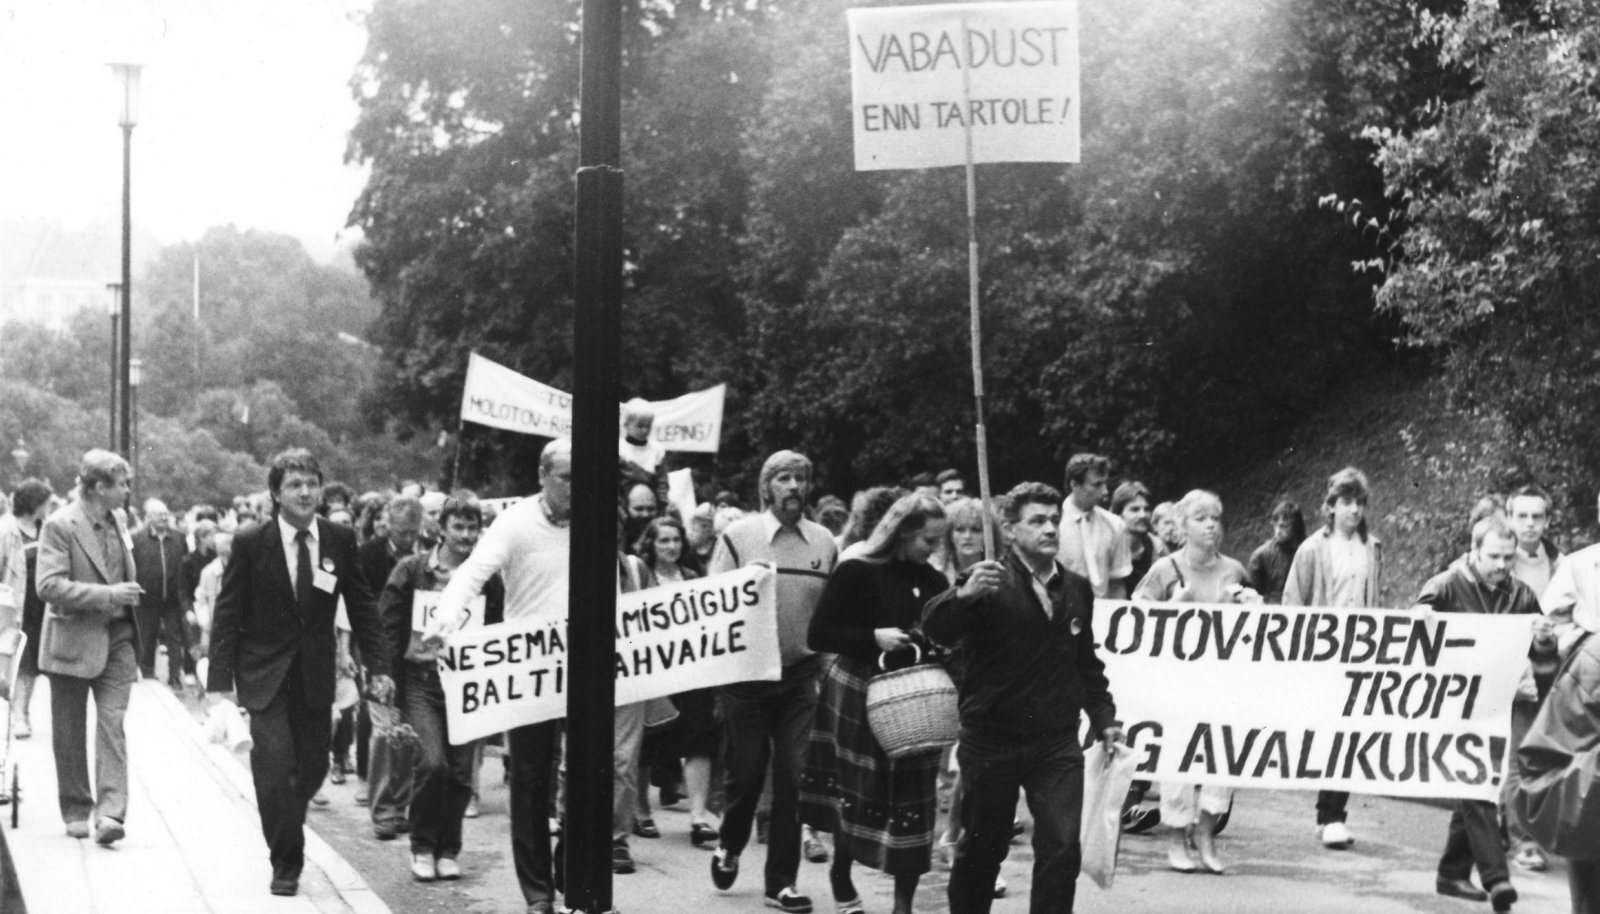 Rongkäik Hirveparki 1987. a 23. augustil. https://objektiiv.ee